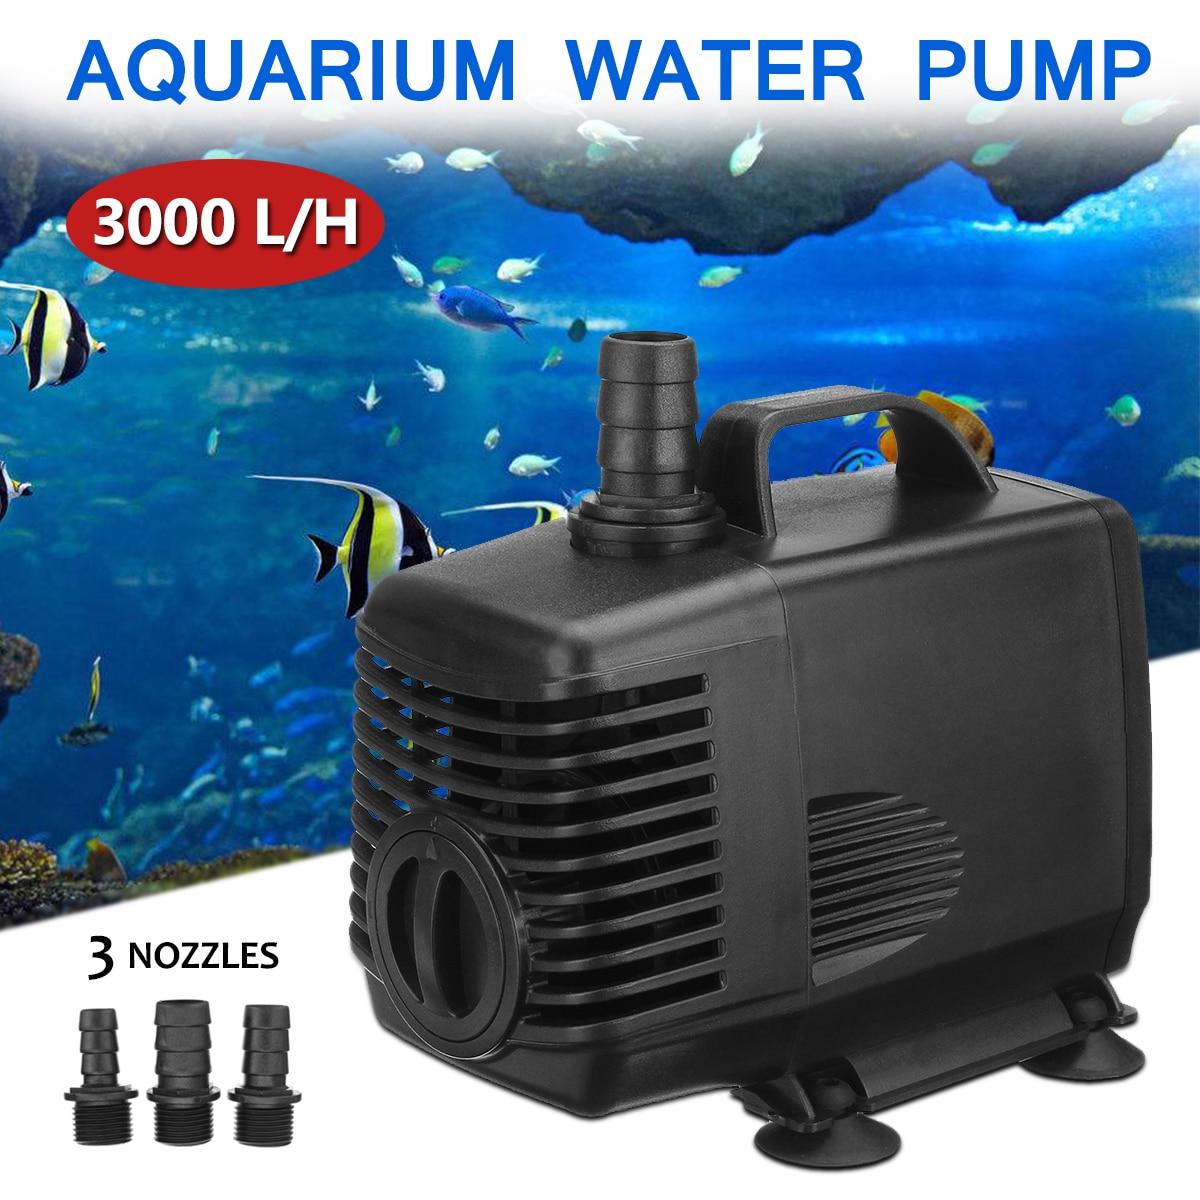 3000L/H 3 Nozzles Aquarium Water Pump 220V-240V 45W Submersible Fountain Fish Tank Pond Fountain Air Water Pump Filter